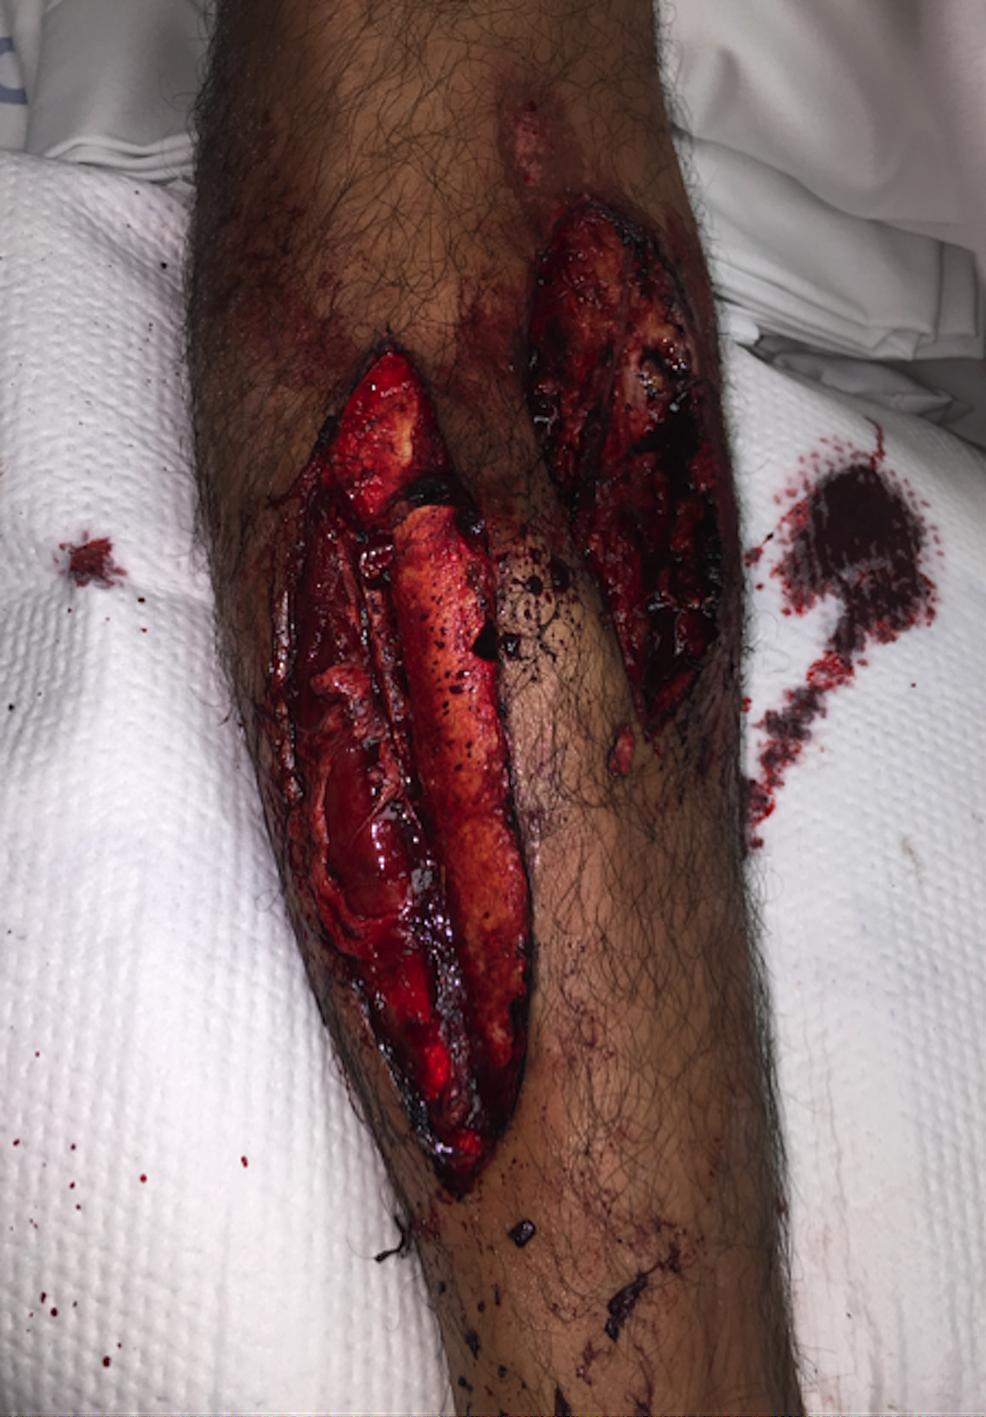 Injury-photograph